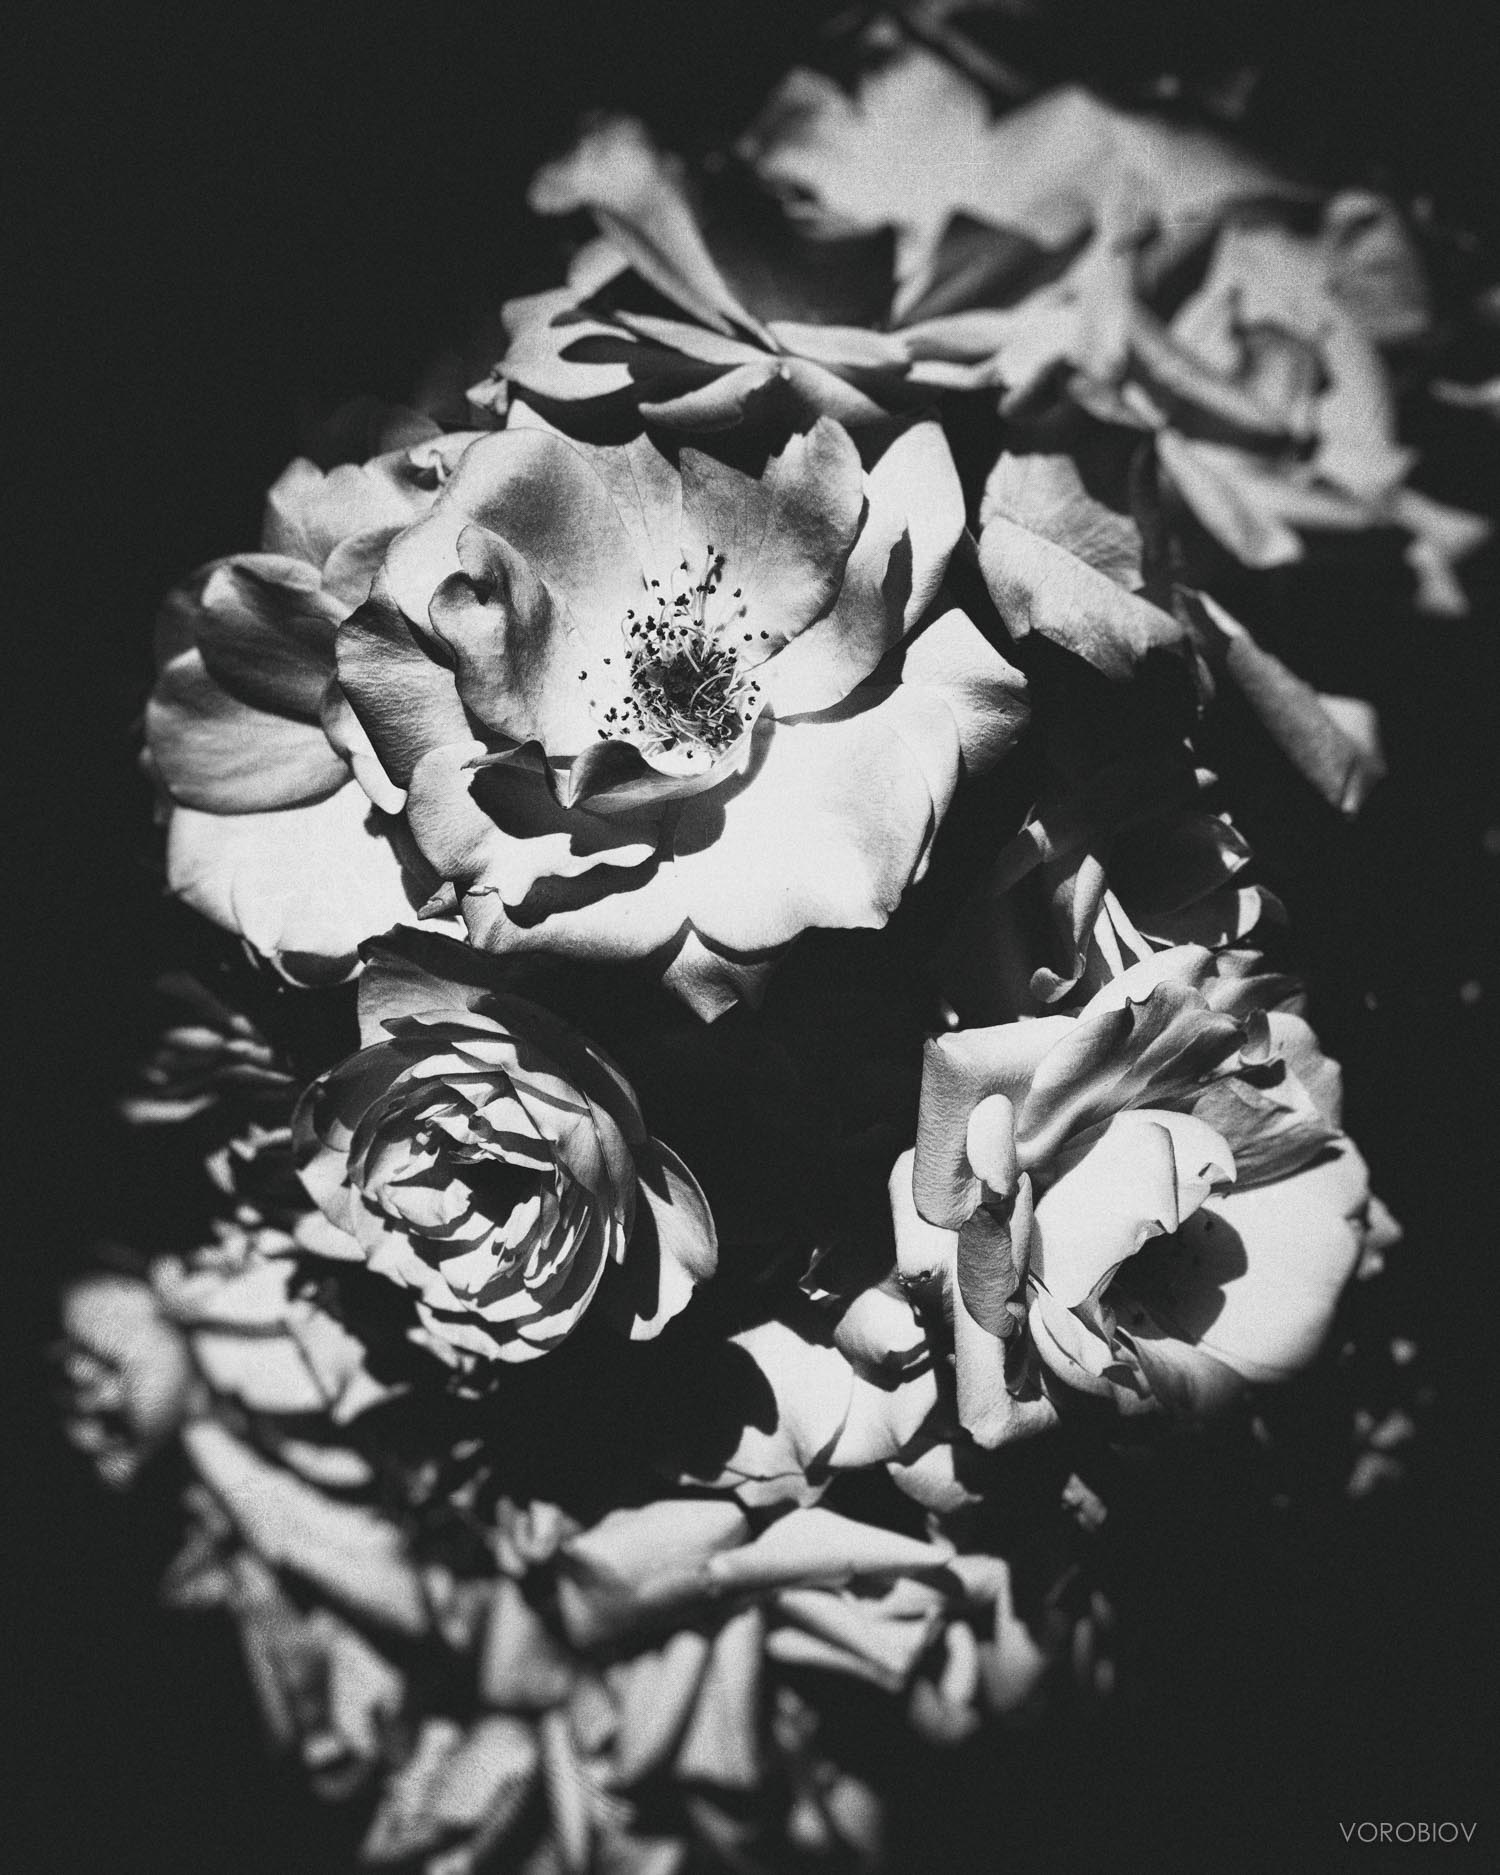 roses by greg vorobiov-.jpg